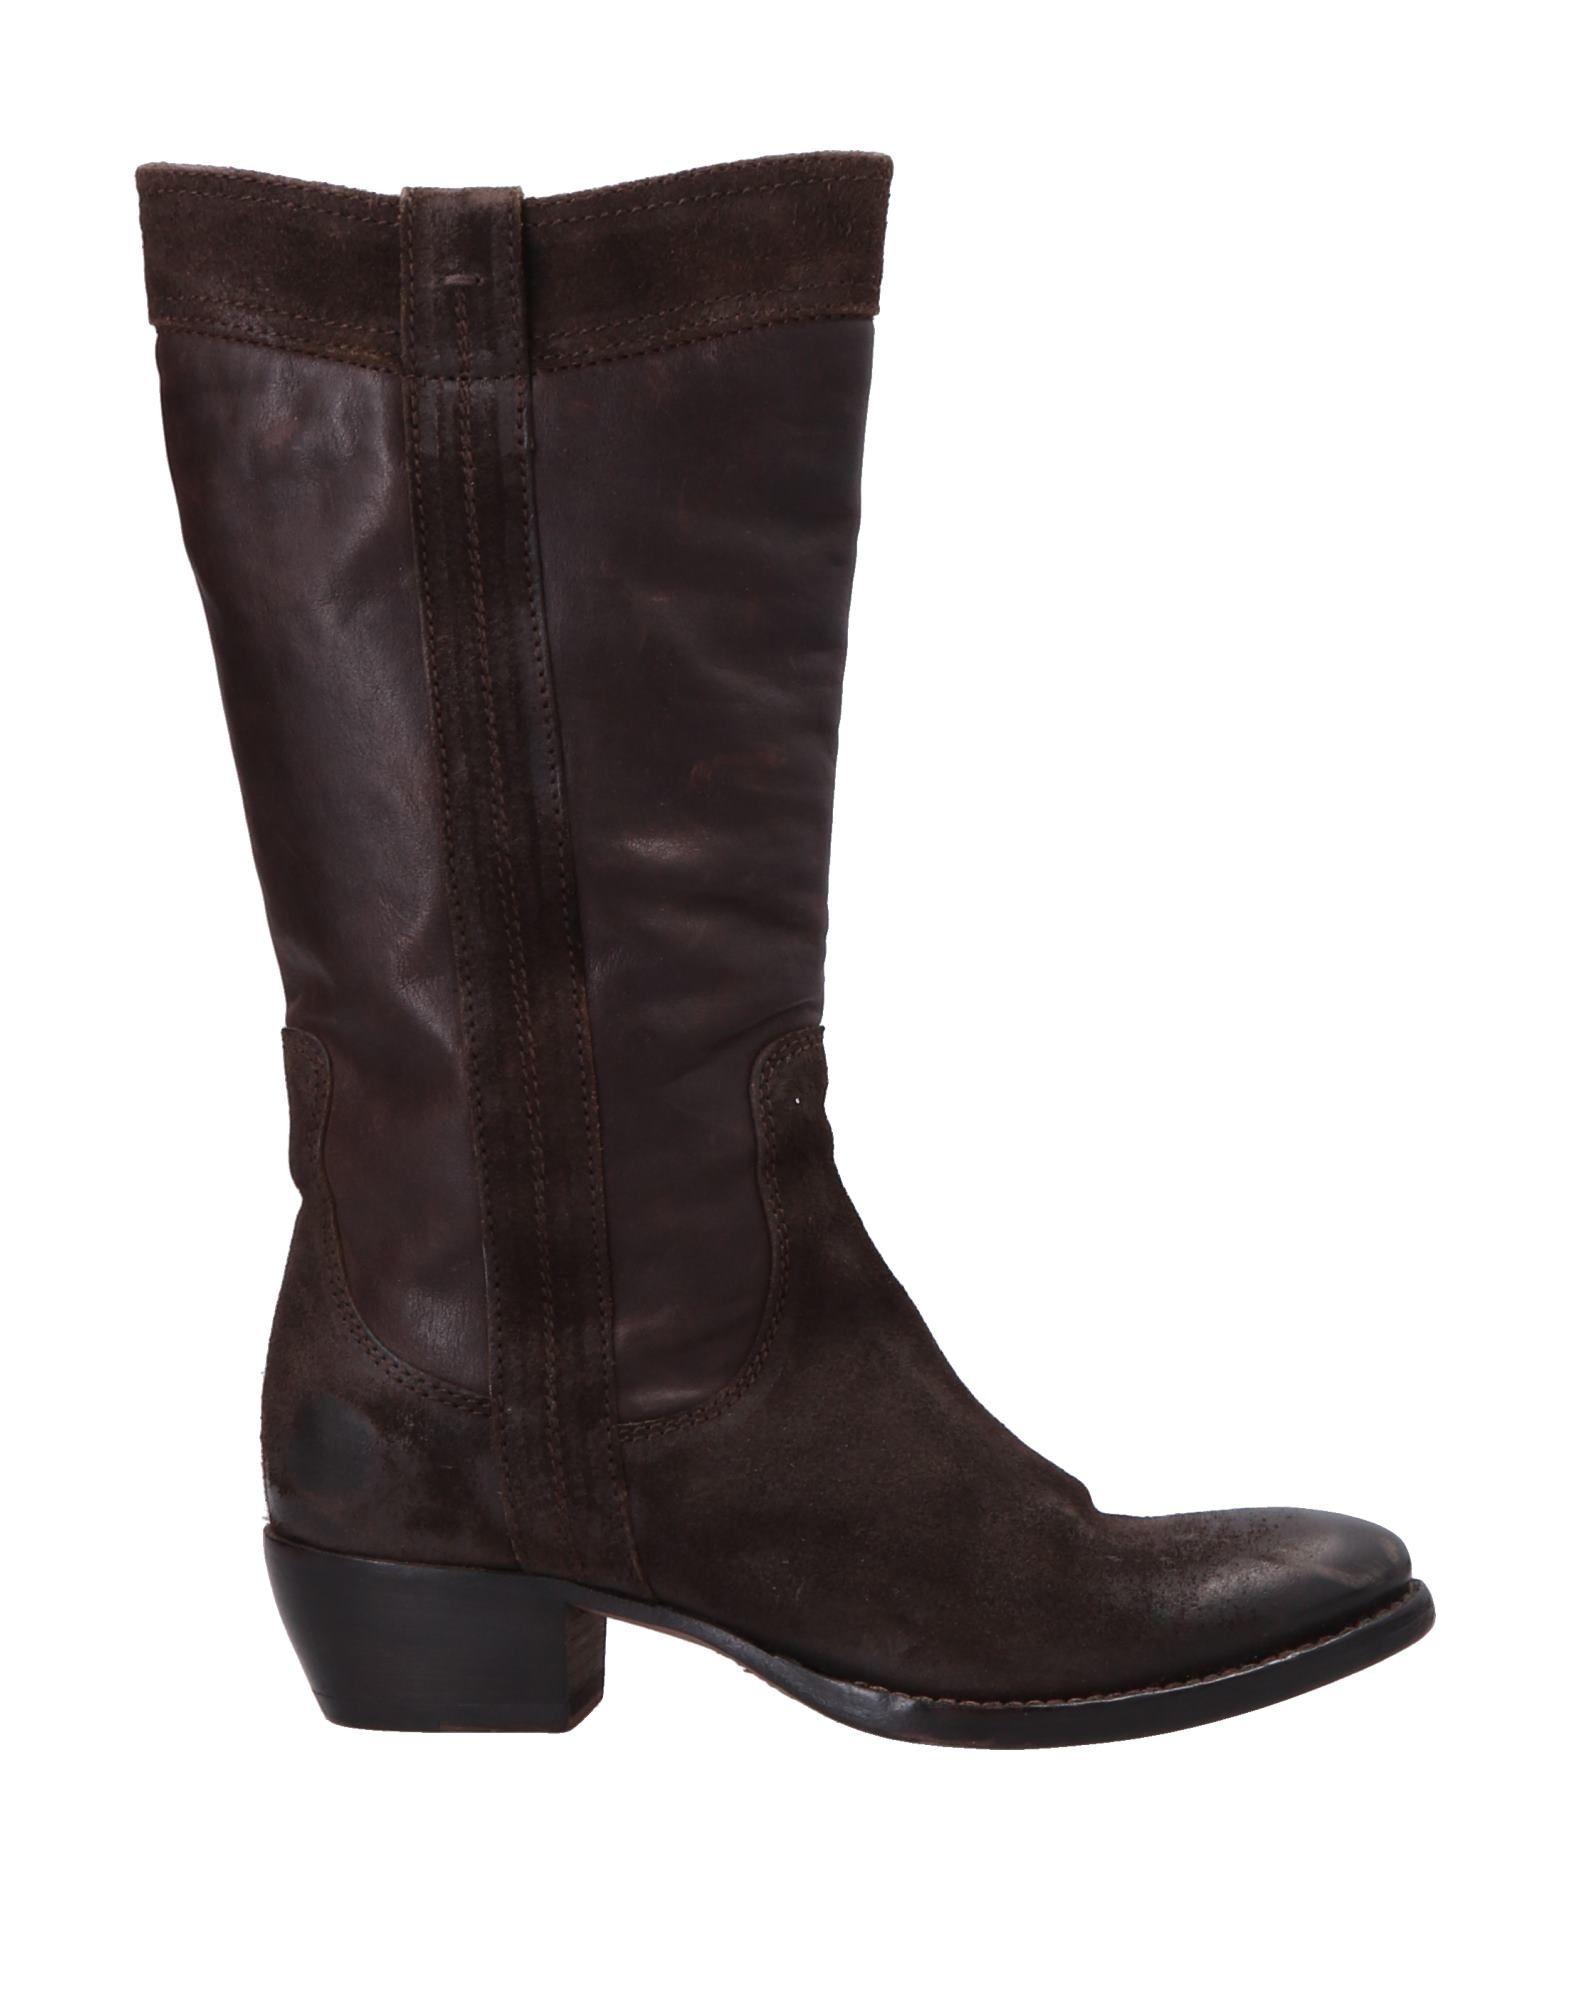 Pantanetti Stiefel Damen  11545564JIGut aussehende strapazierfähige Schuhe